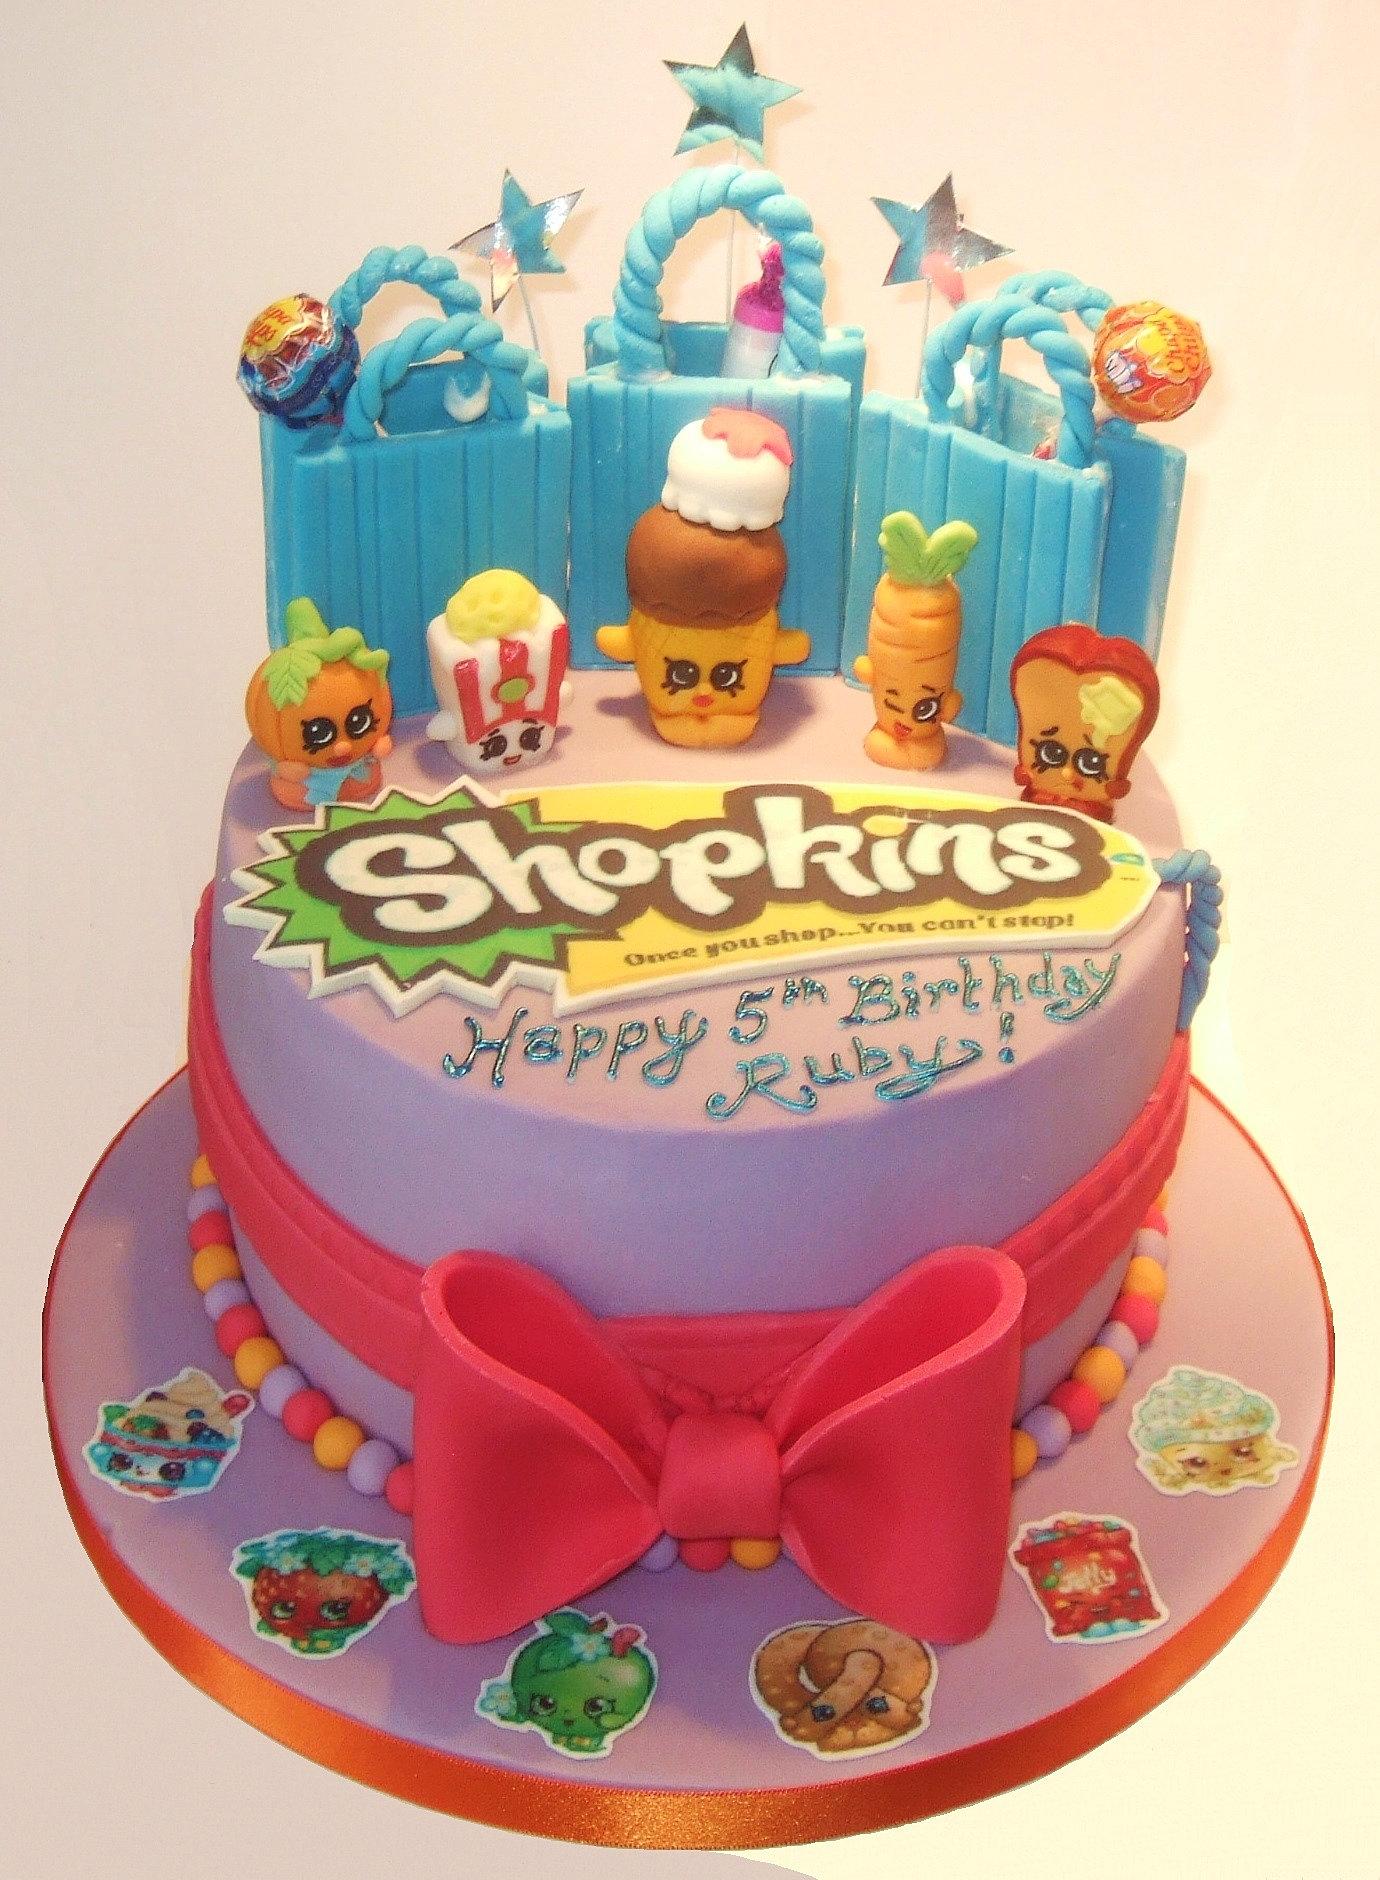 Shopkin Cakes Images Shopkin Cake Image